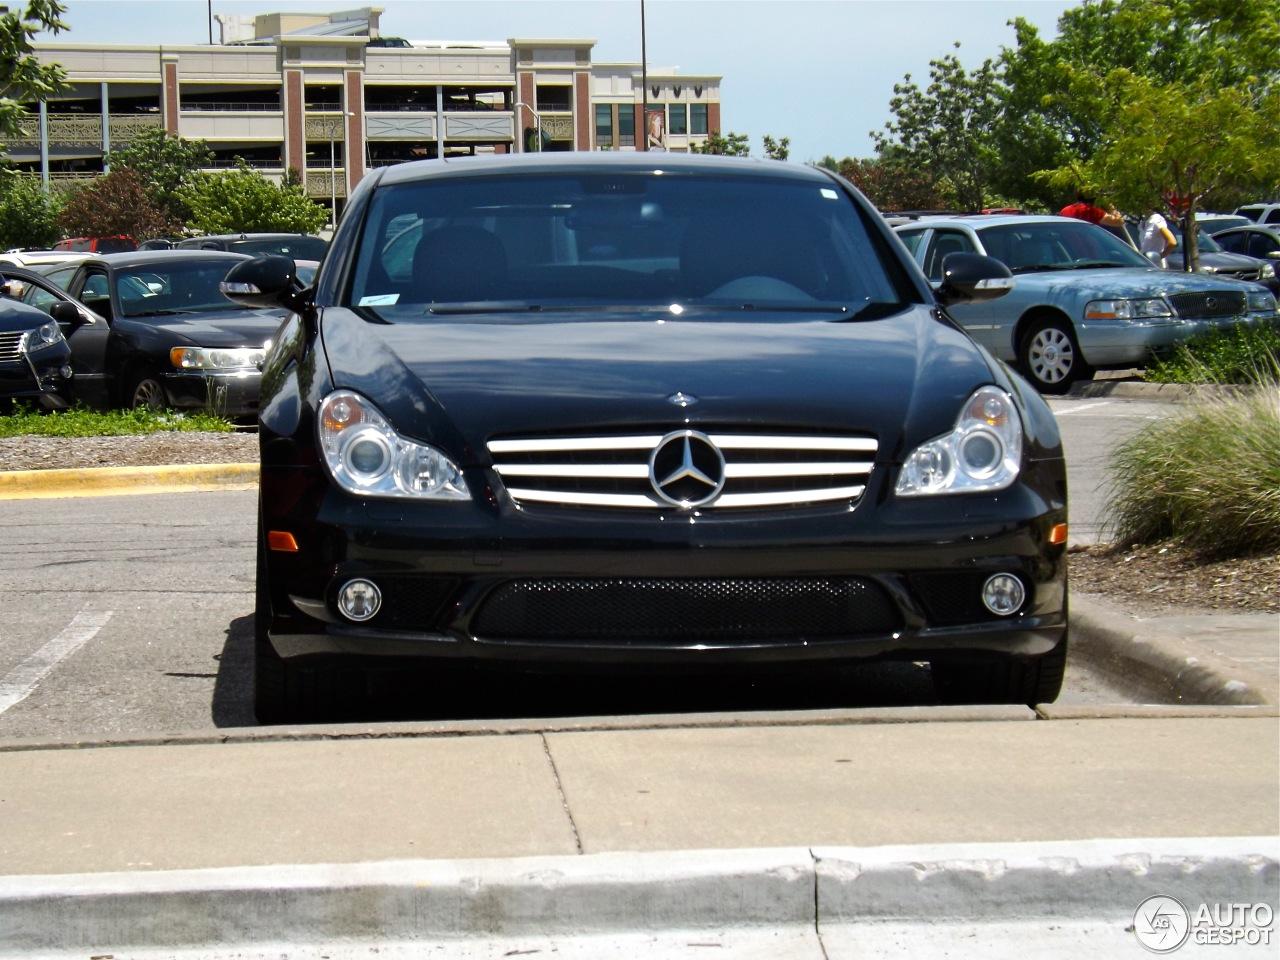 Mercedes benz cls 55 amg 13 june 2013 autogespot for Mercedes benz cl 55 amg